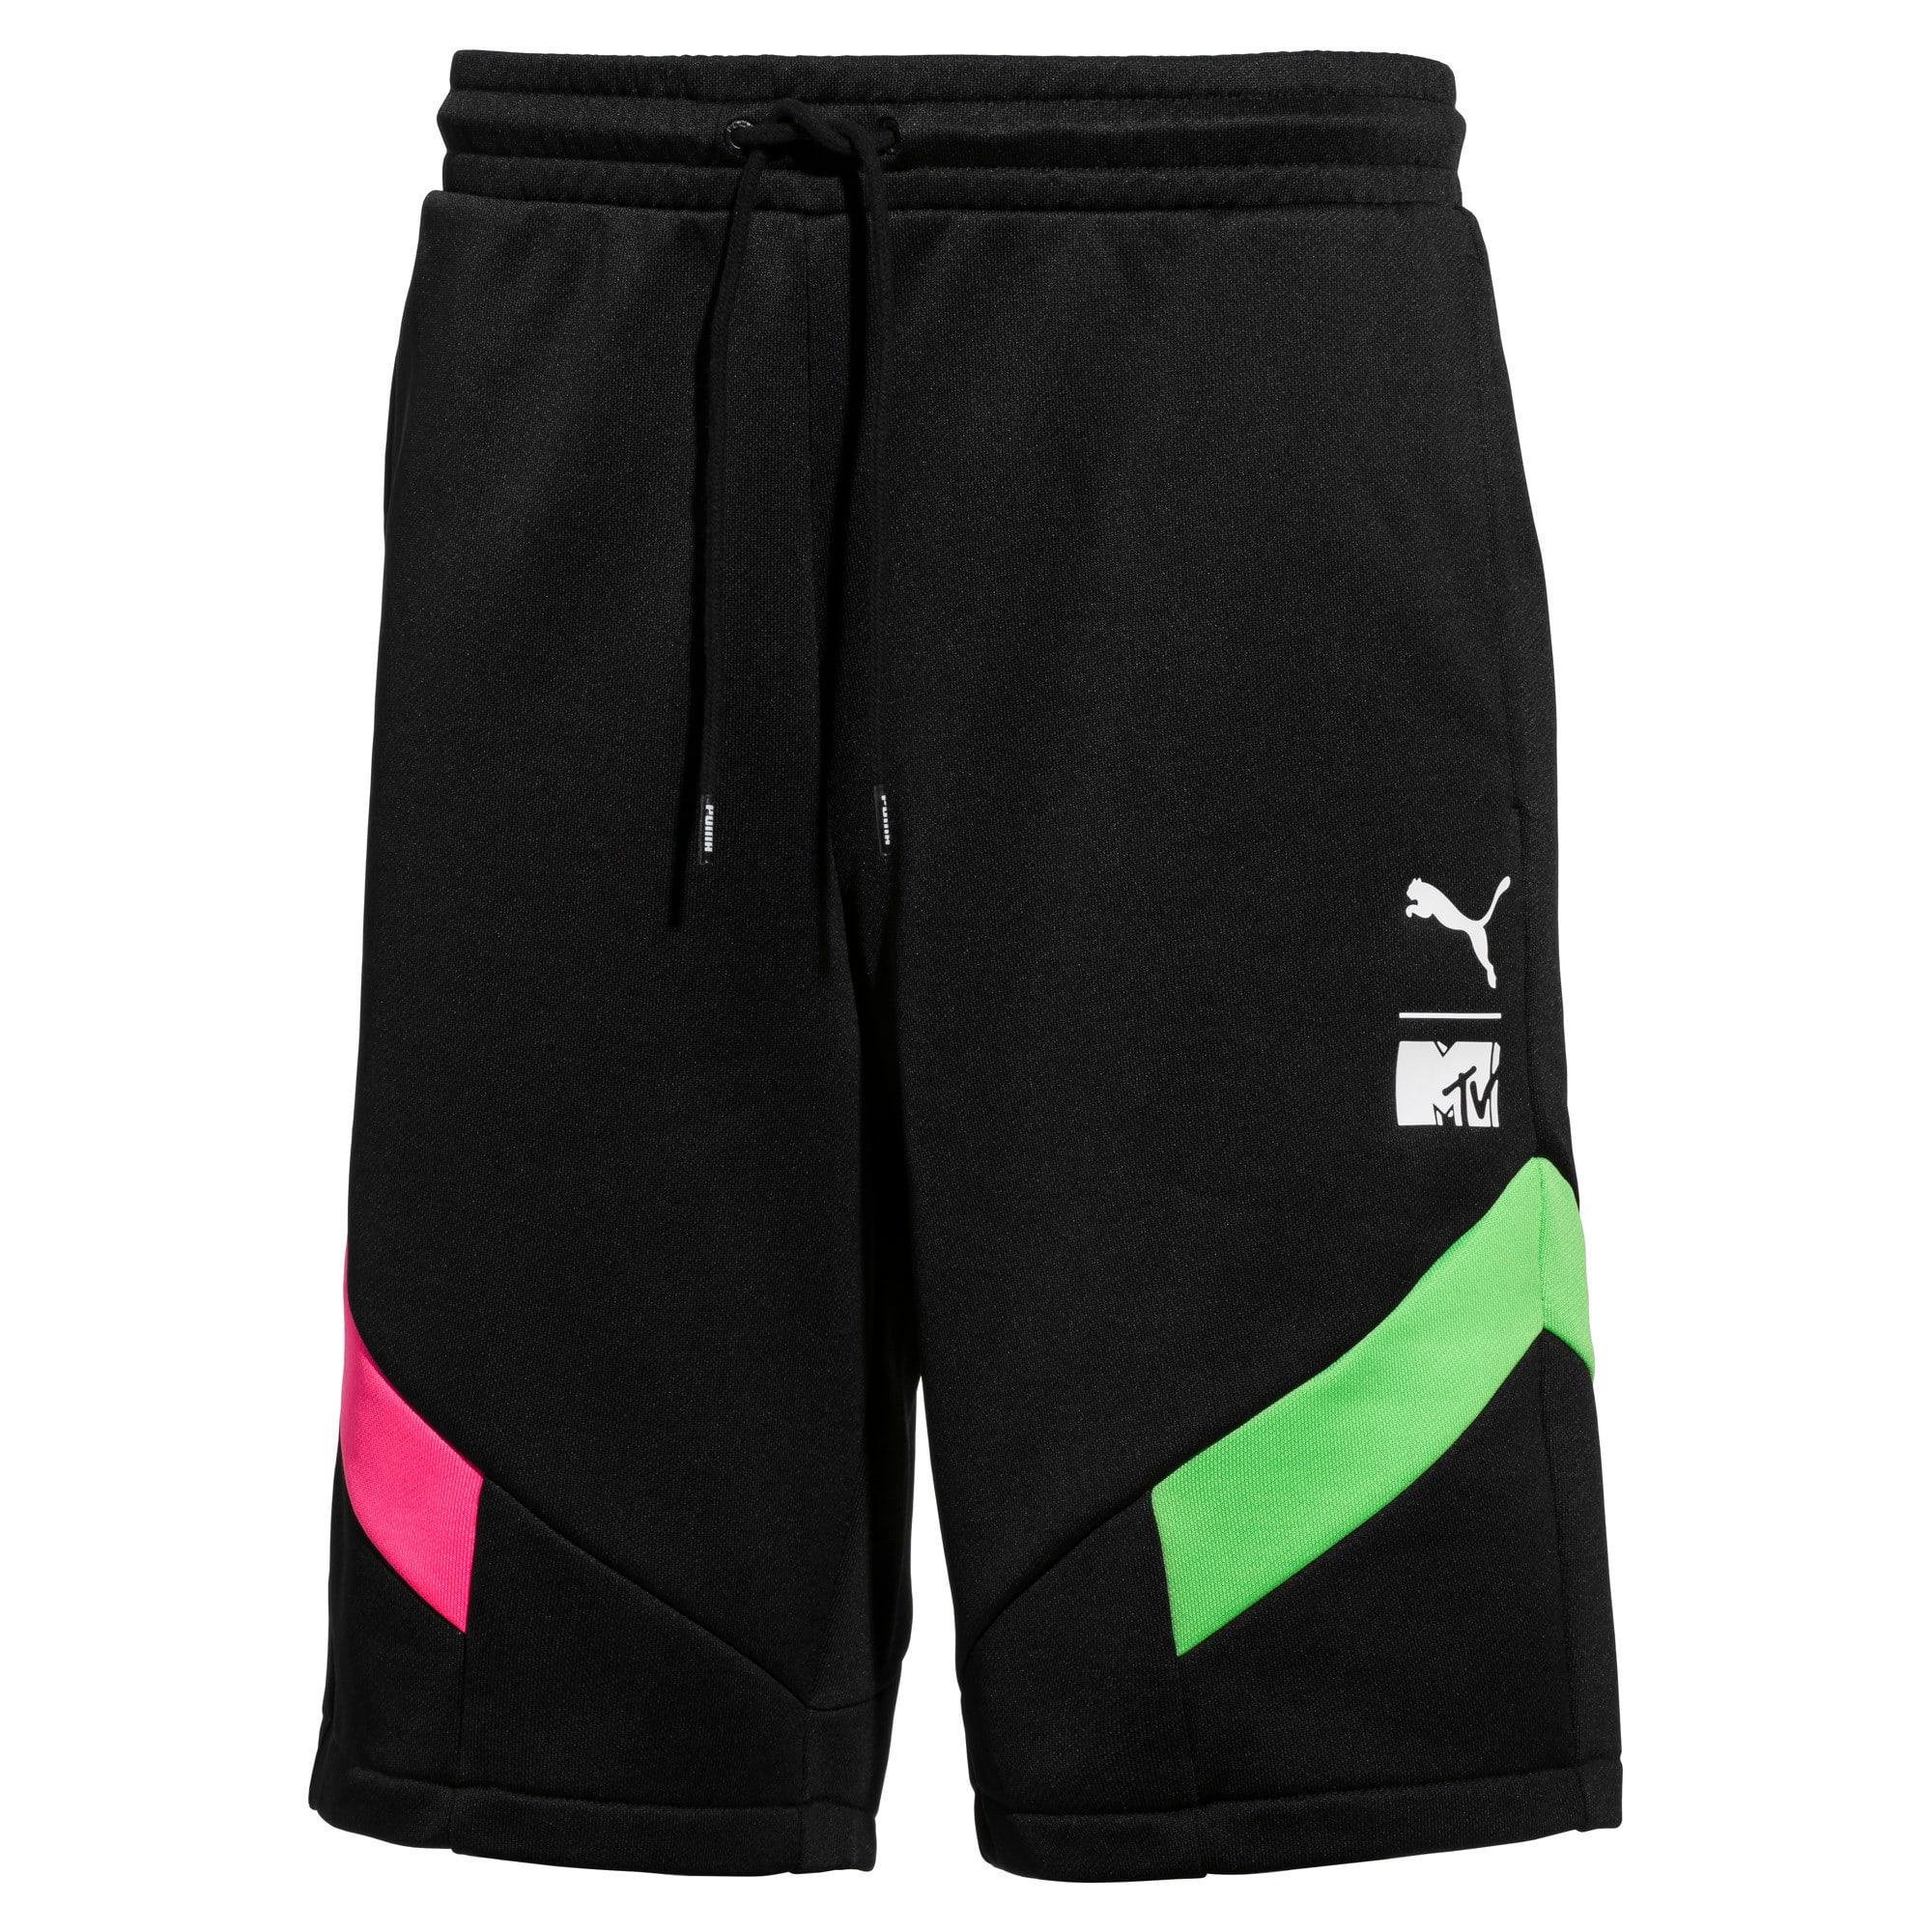 Thumbnail 1 of PUMA x MTV MCS Men's Shorts, Puma Black, medium